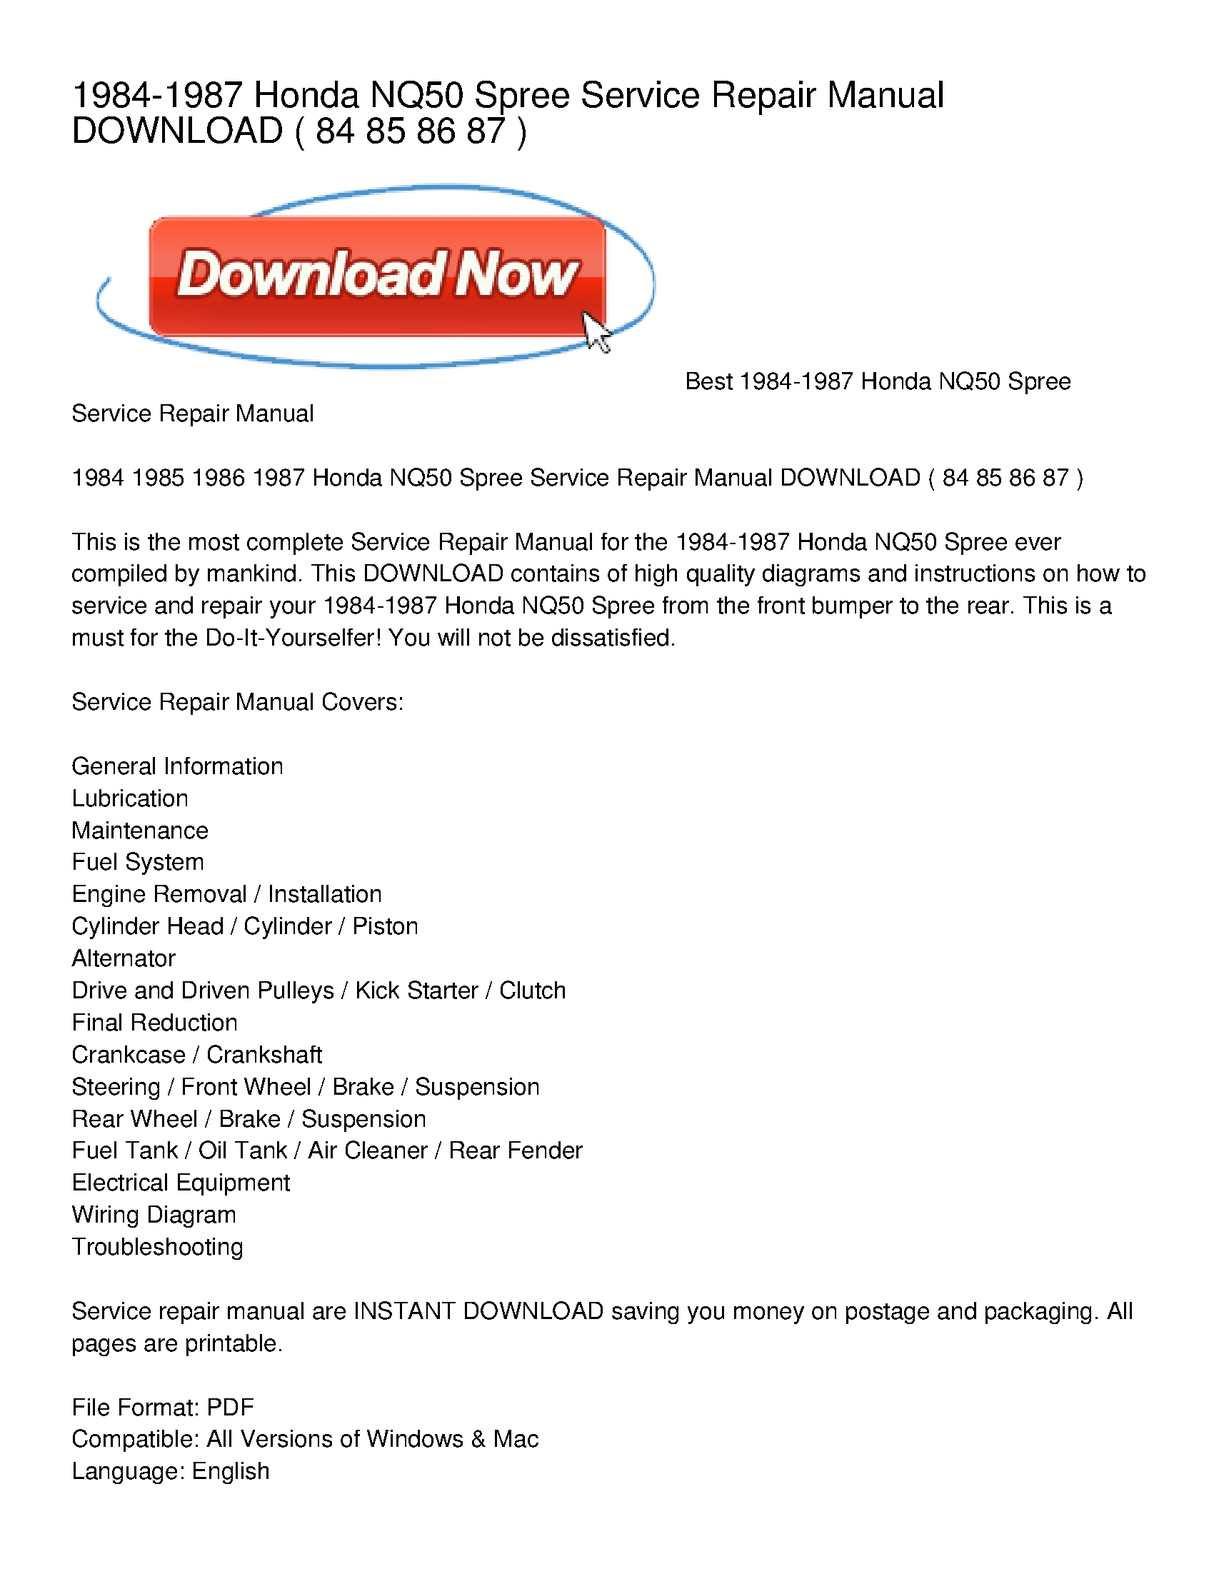 5915a5 Ebook 2785 Honda Spree Nq50 Service Repair Manual 1984 1987 2019 Wiring Library